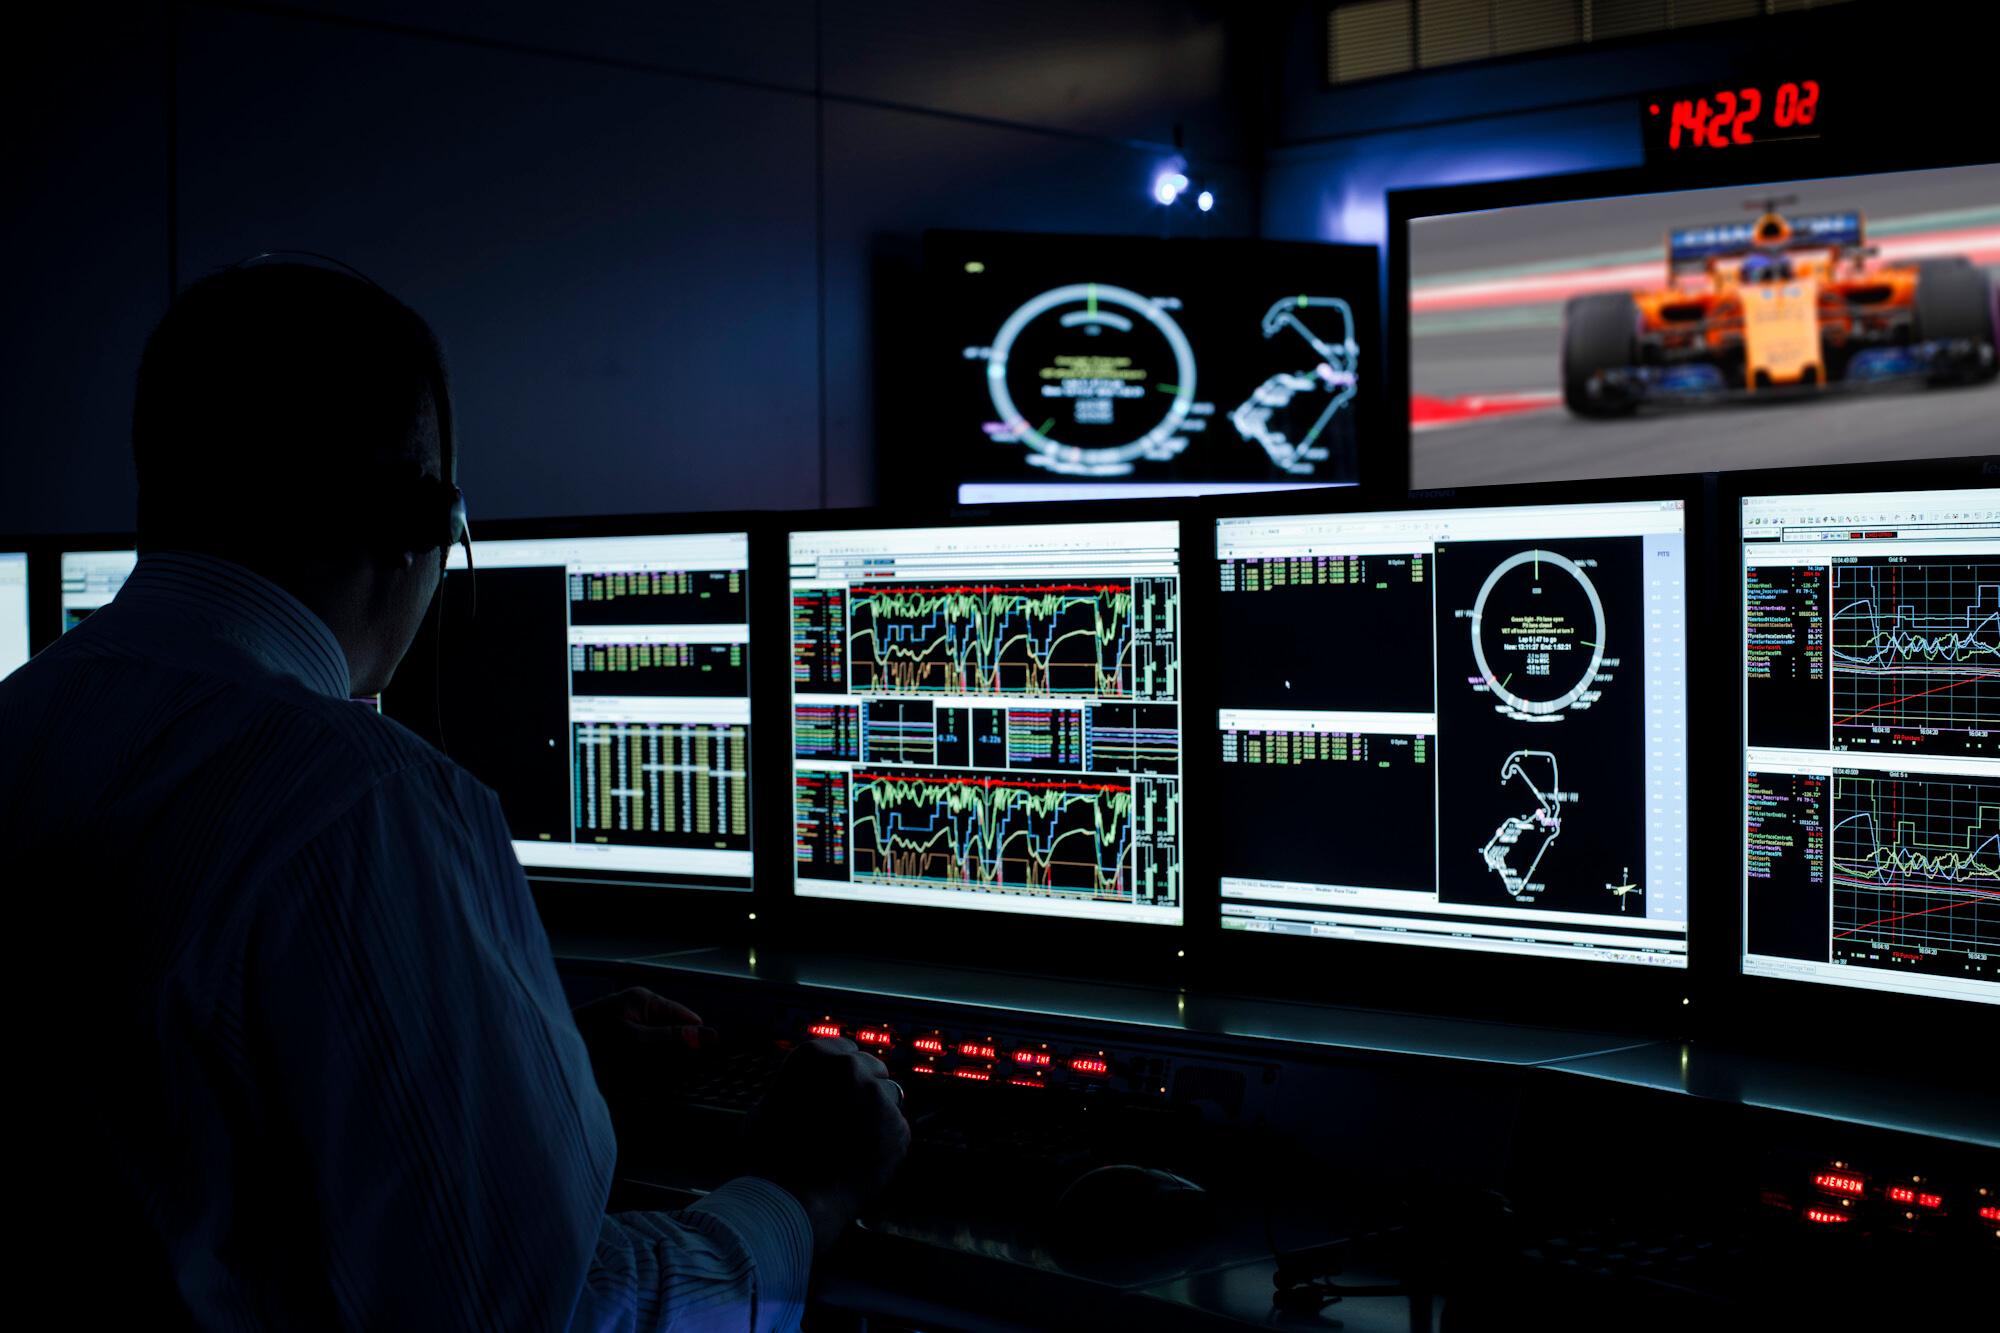 Performance Technology: Singapore Deploys McLaren's F1 Tech To Monitor MRT Train